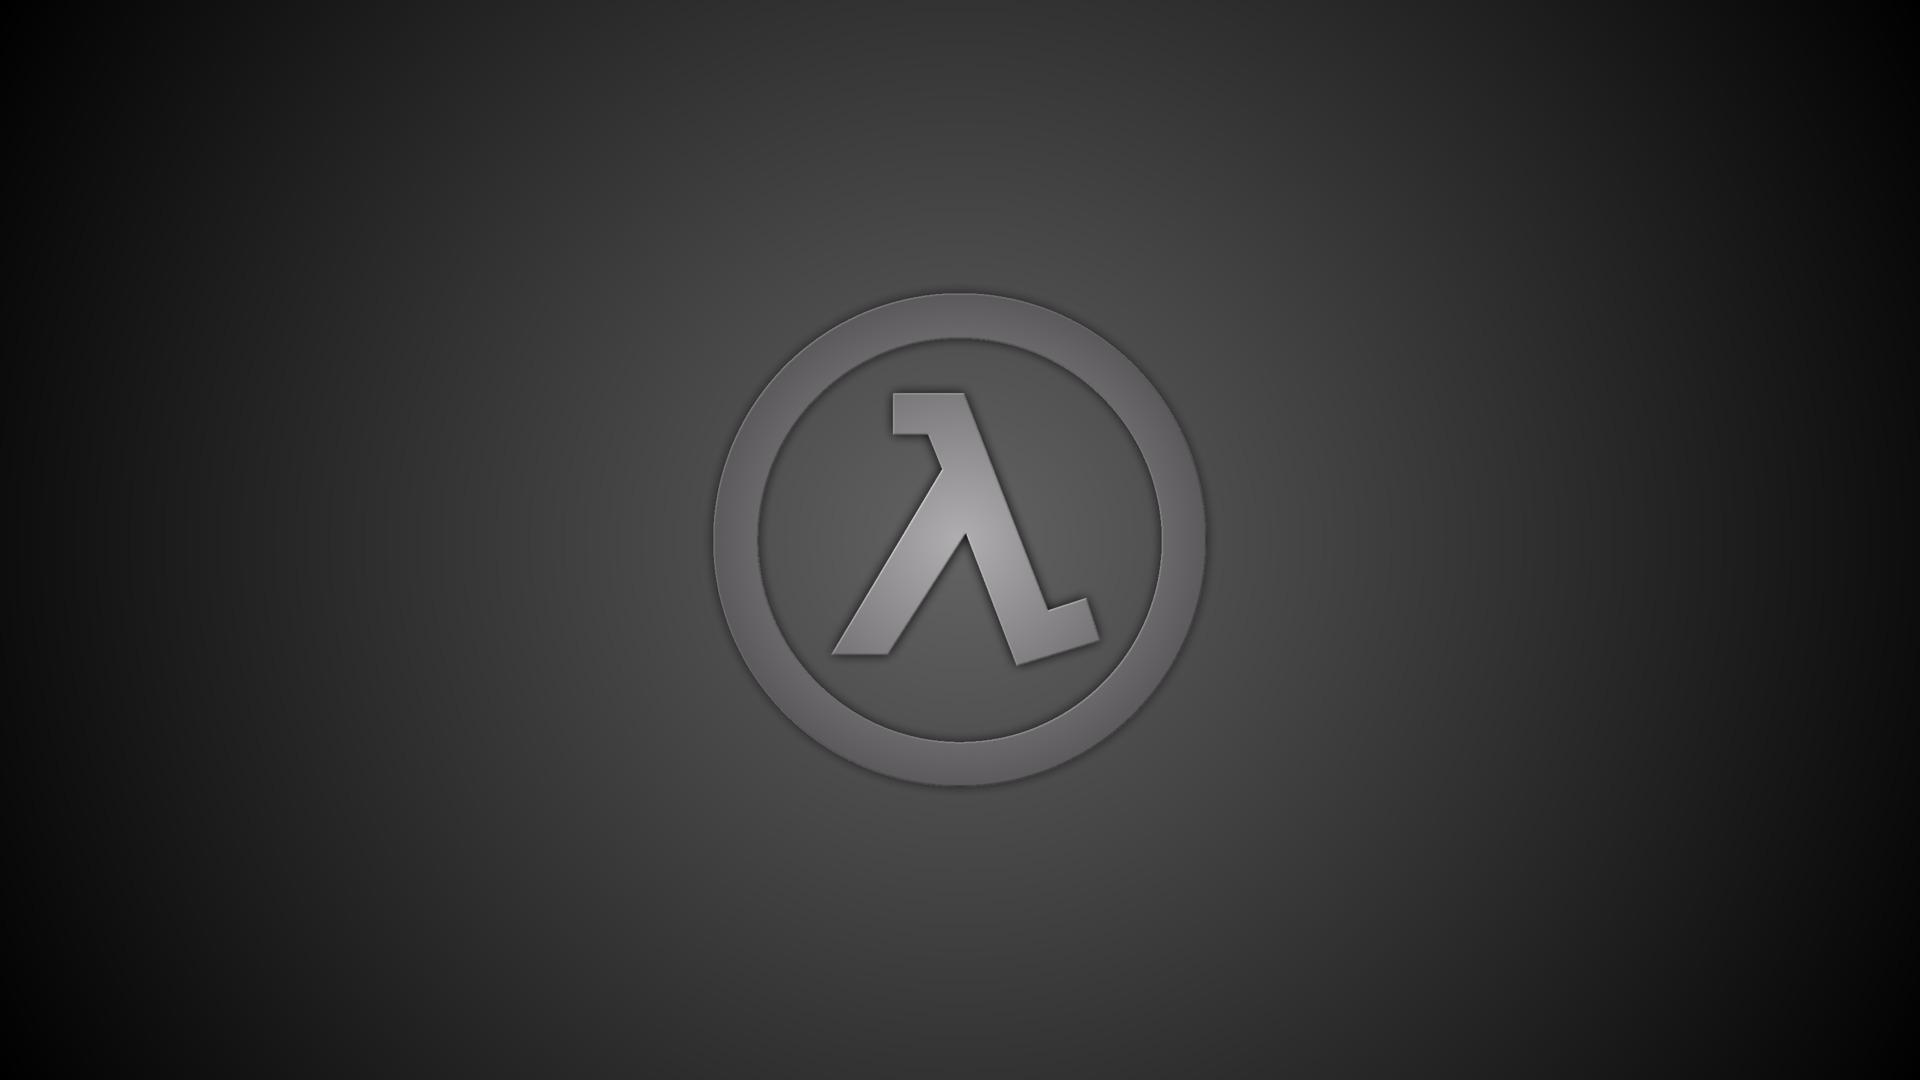 Half Life Logo p hd hd